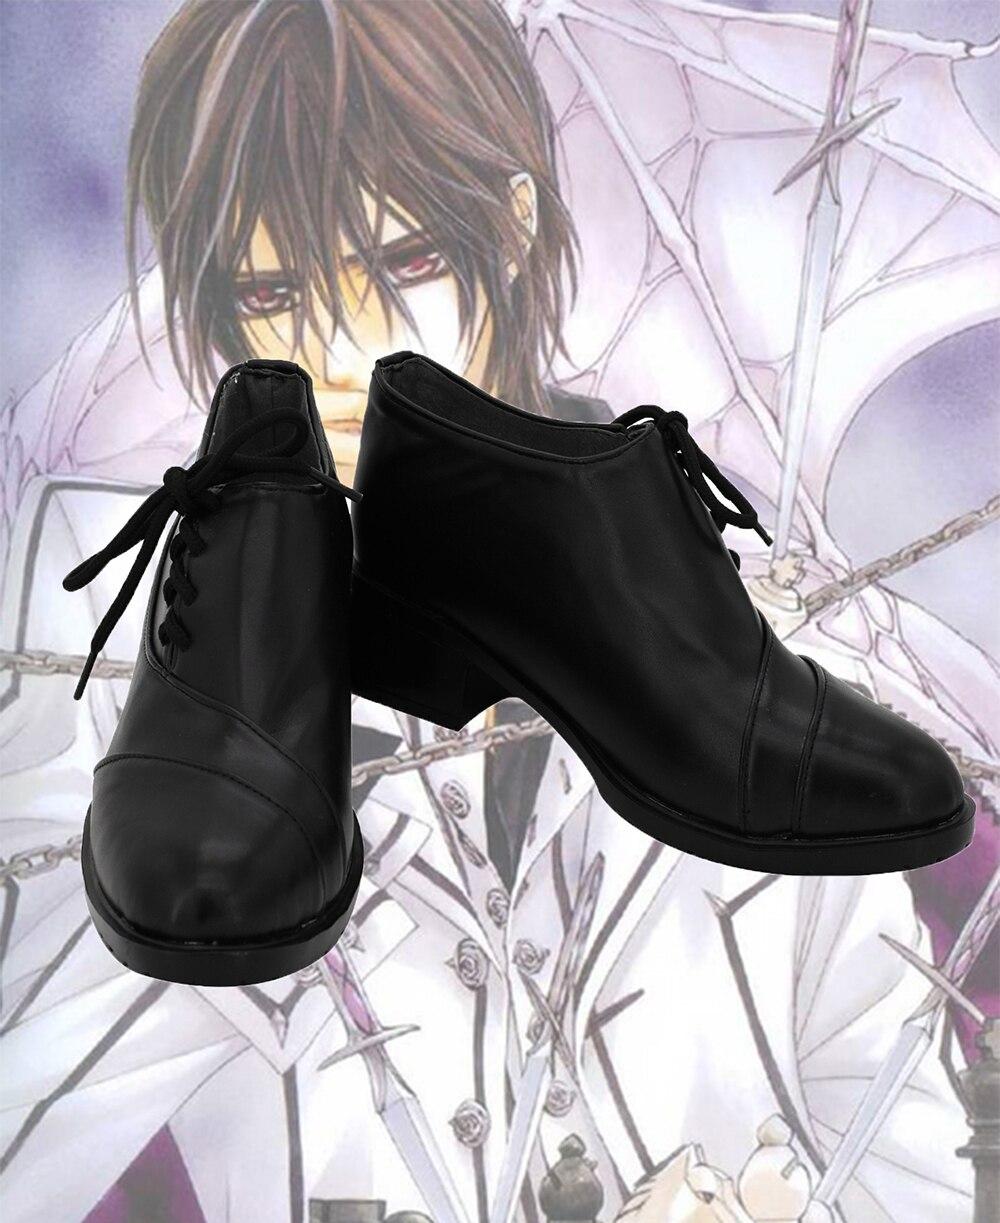 Vampire Knight Clan Kaname Cosplay chaussures bottes noires sur mesure toutes tailles